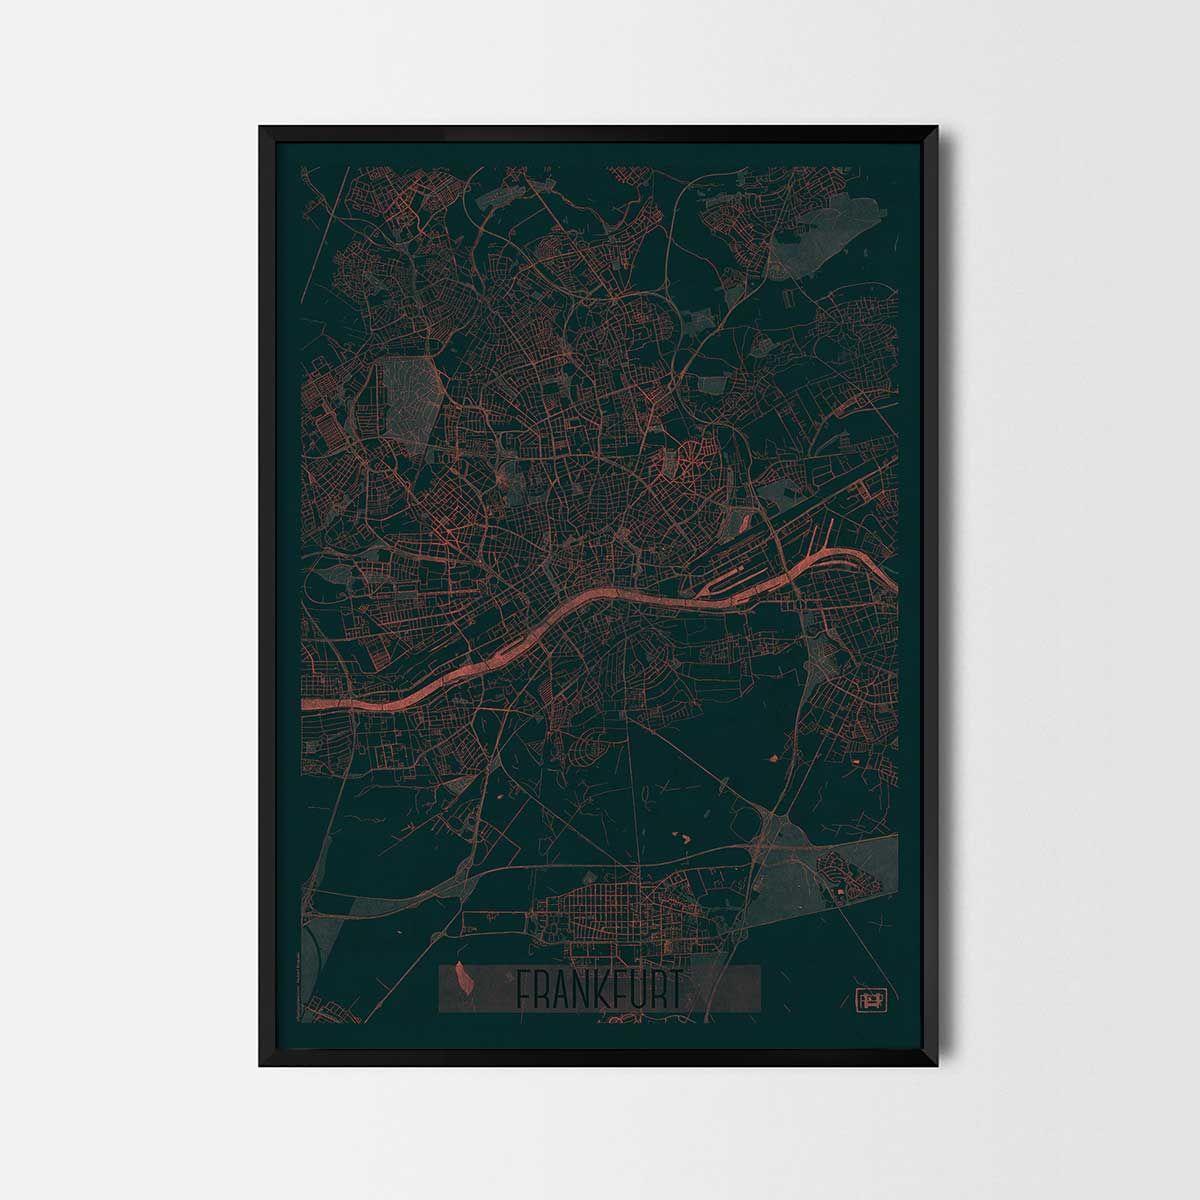 Frankfurt city posters - City Art Posters and prints | Geschenke für ...